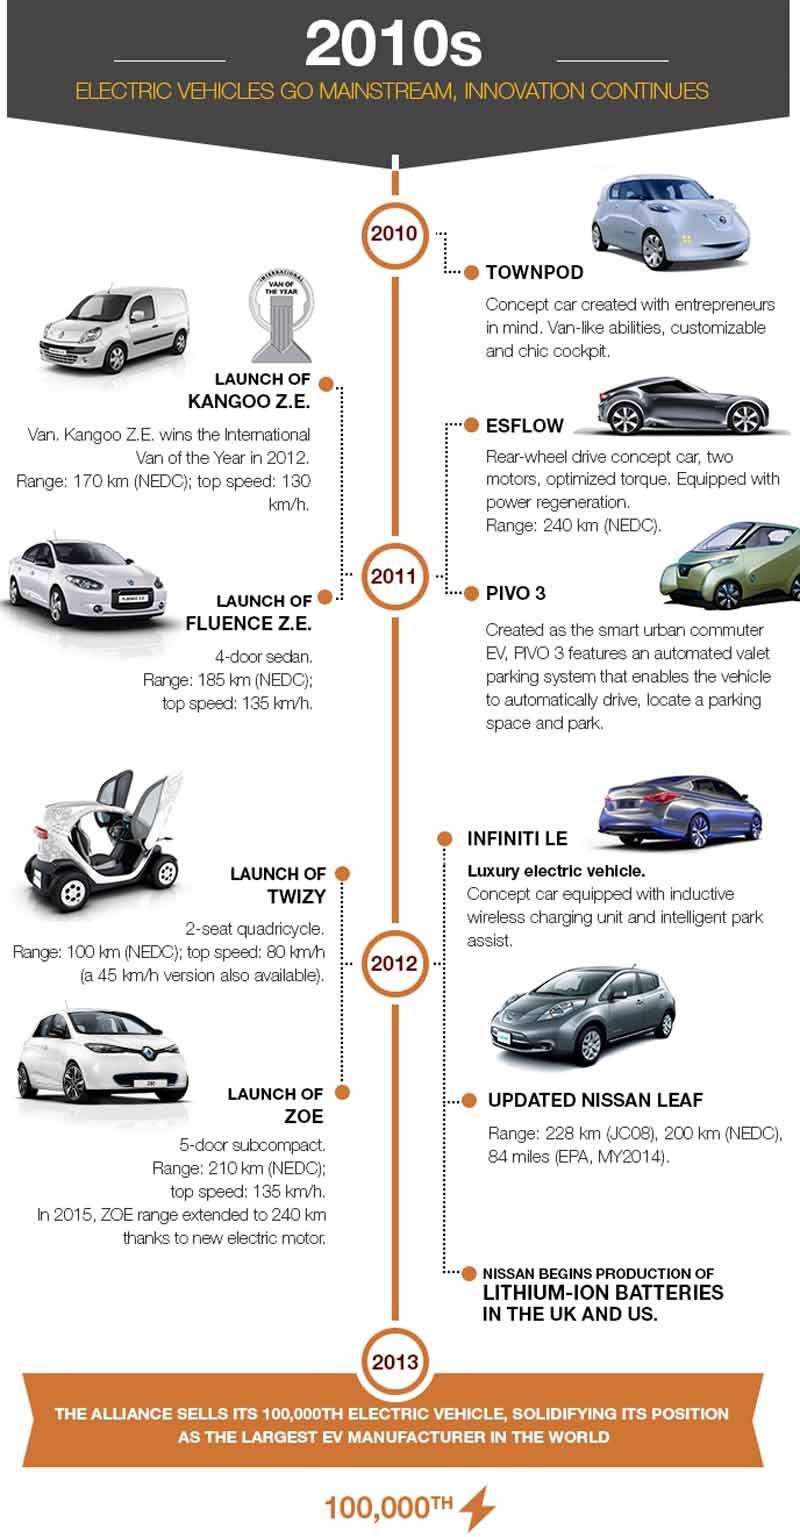 renault-nissan-alliance-electric-car-sales-total-250000-units-a-report20150702-3-min